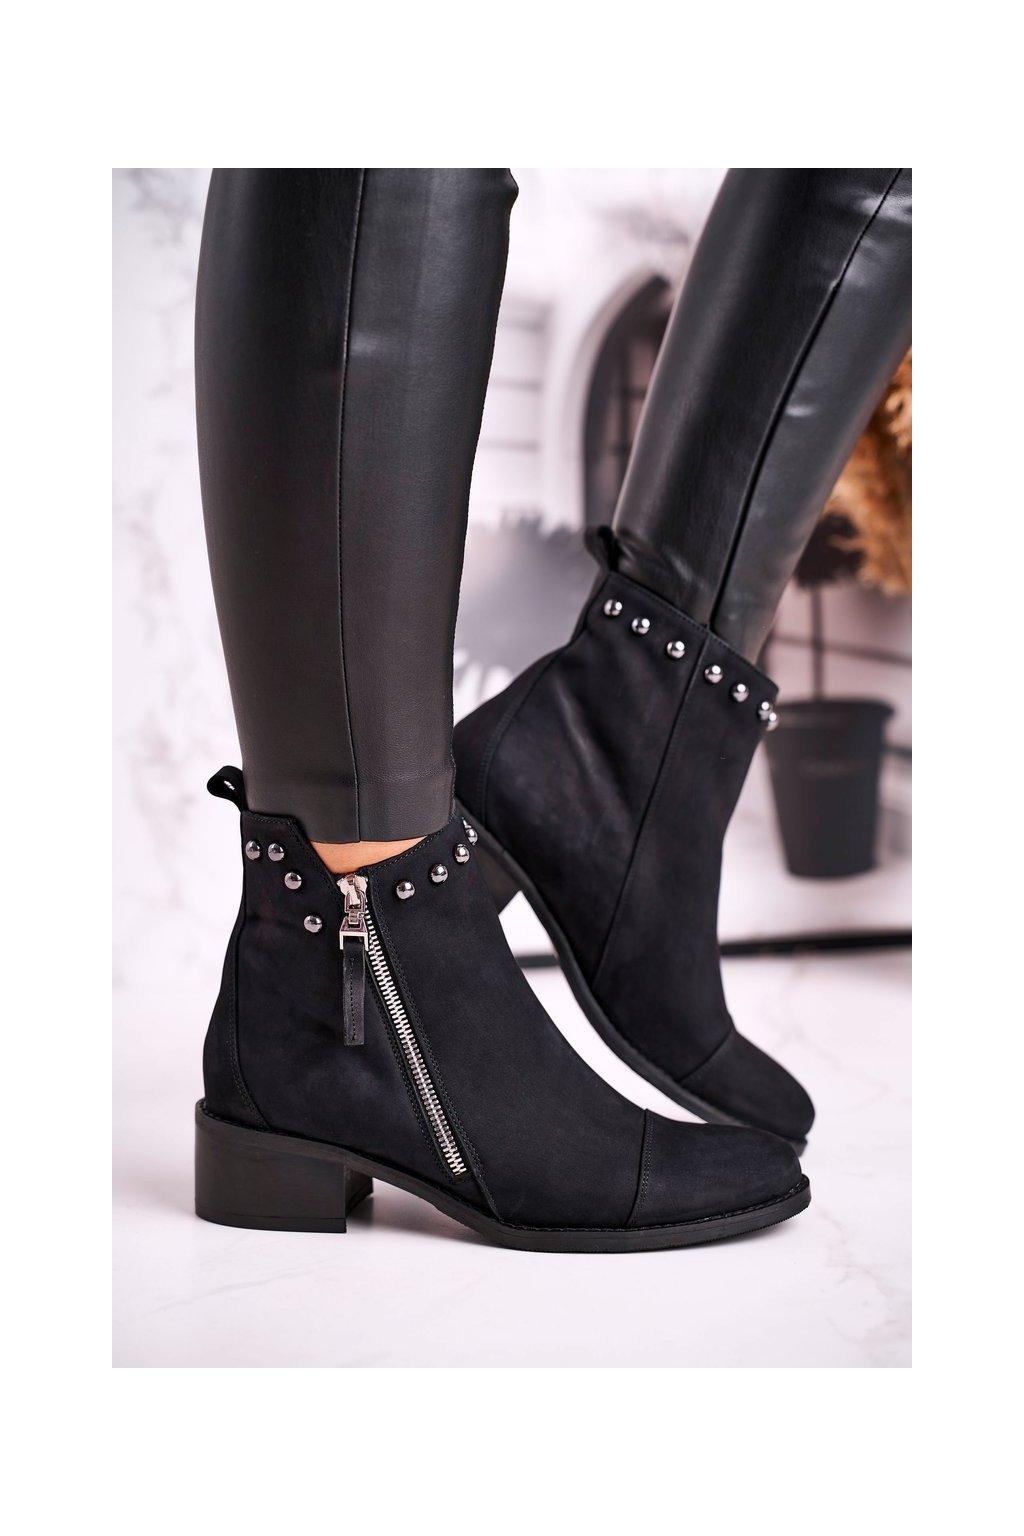 Členkové topánky na podpätku farba čierna NJSK 1879 BLK